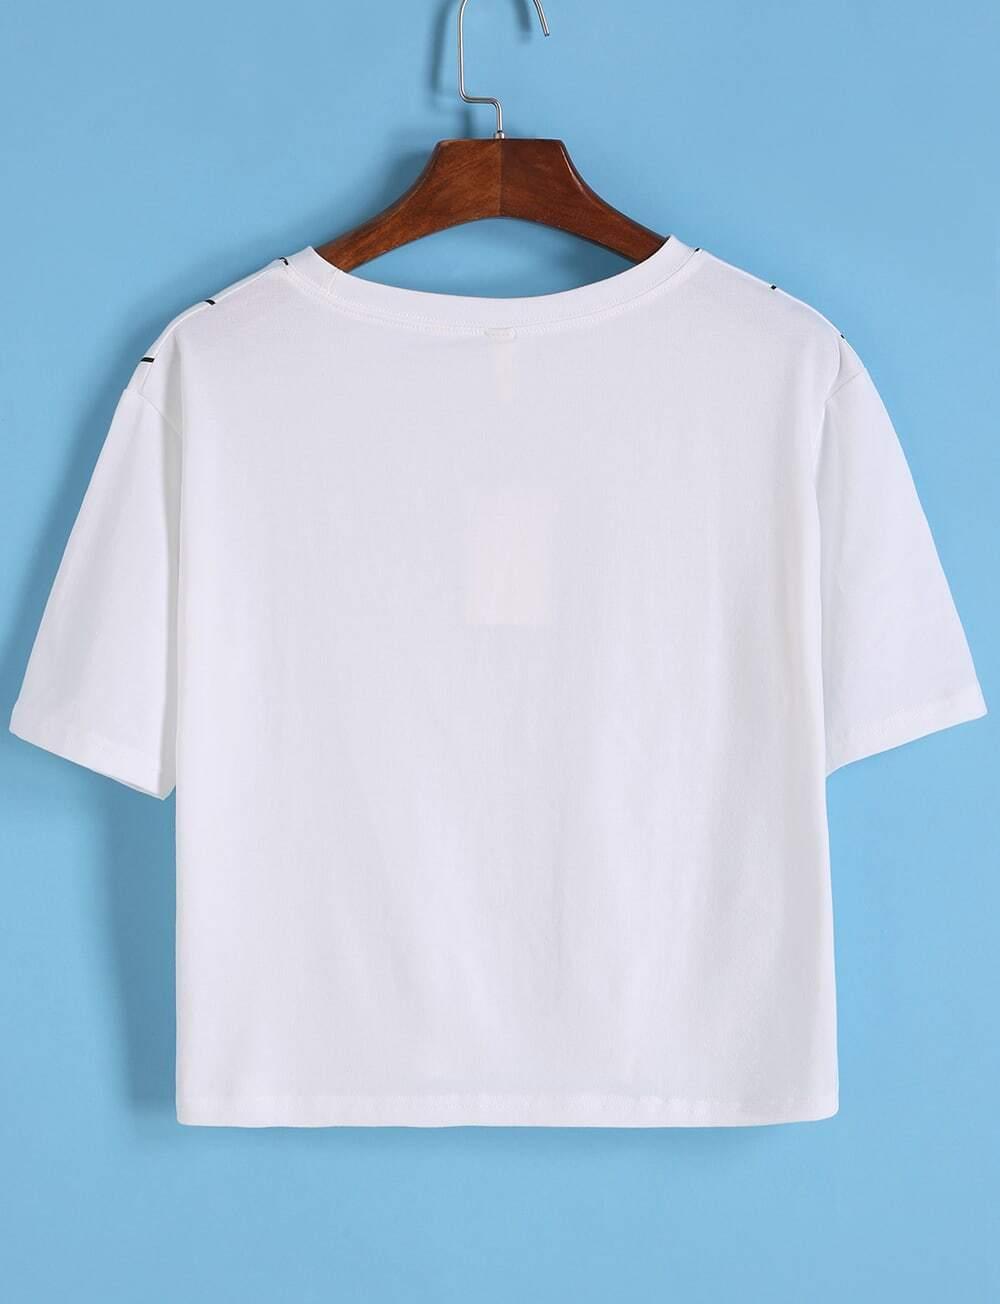 Letter Print Vertical Striped White T-shirt -SheIn(Sheinside)